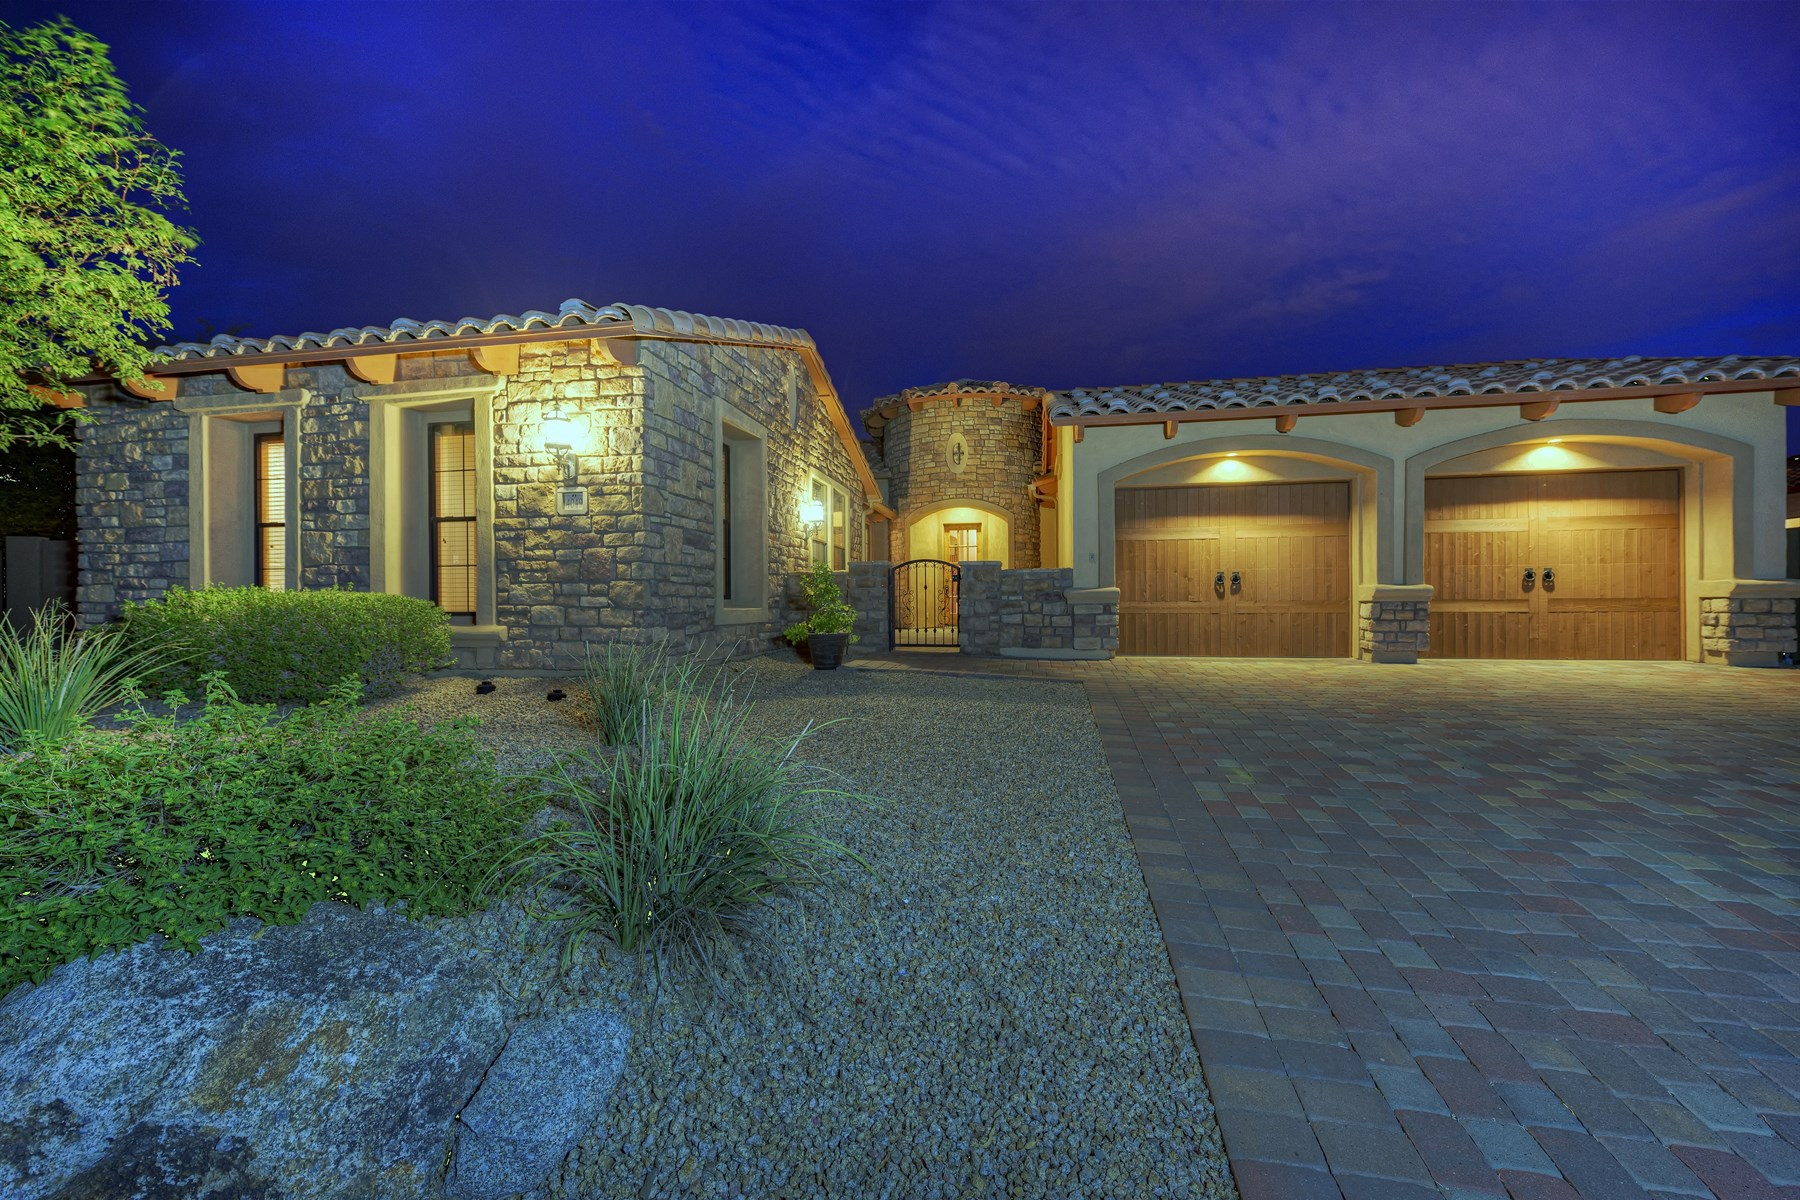 Maison unifamiliale pour l Vente à Fabulous Resort Style home in gated Legacy Hills at Las Sendas Mountain 4049 N Silver Ridge Cir Mesa, Arizona 85207 États-Unis